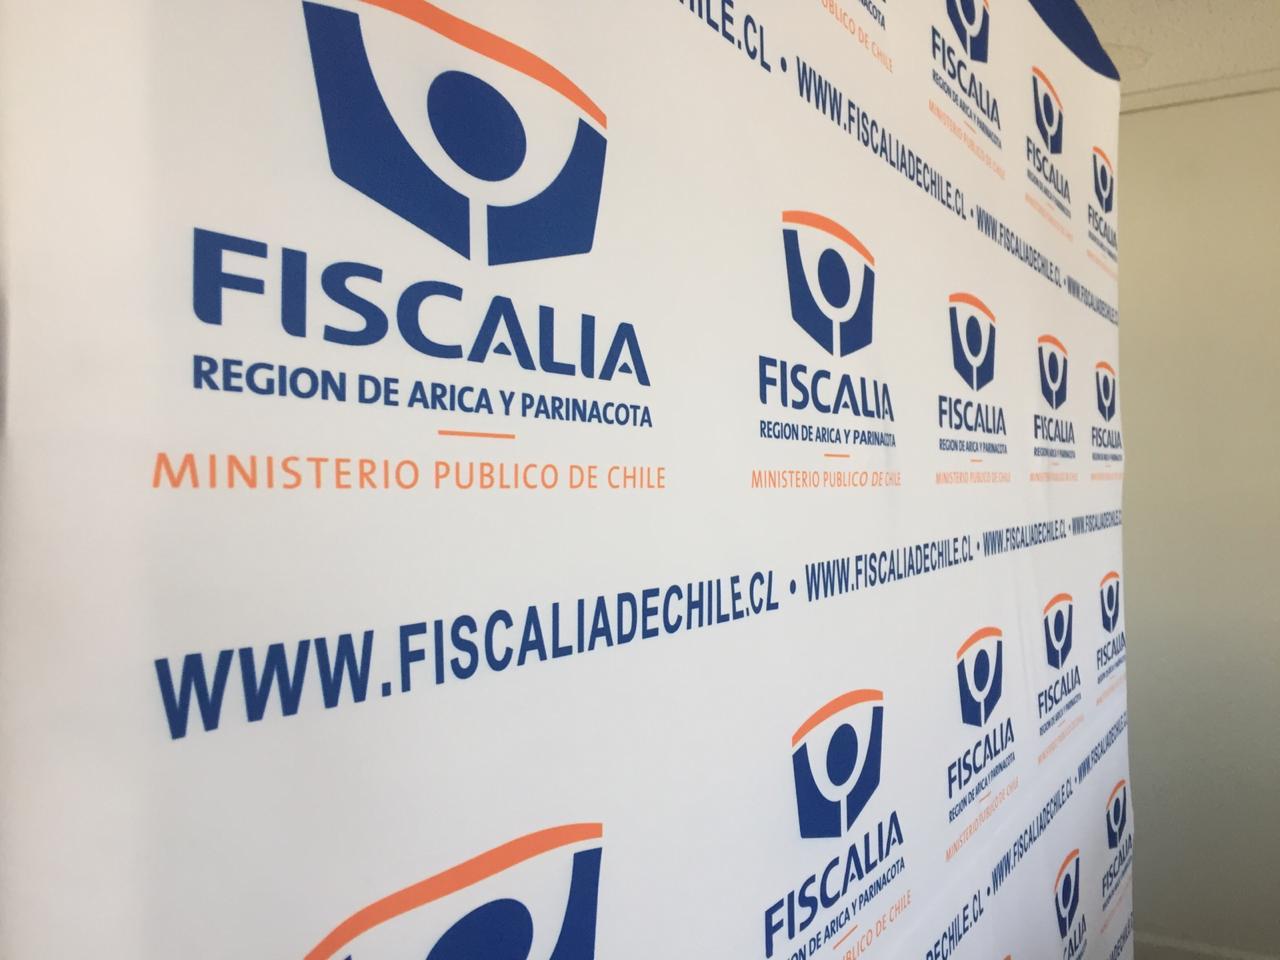 Fiscal-a